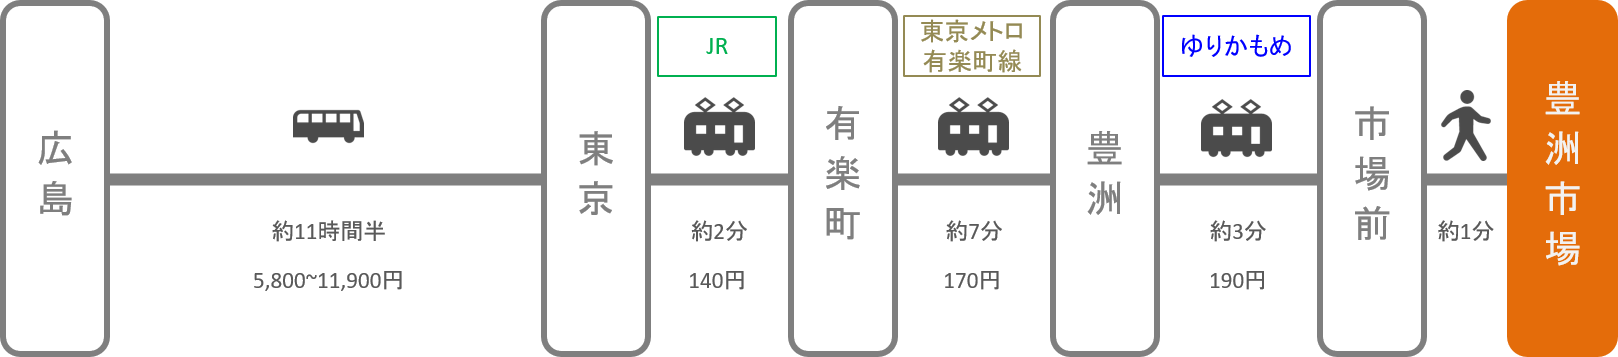 豊洲市場_広島_高速バス